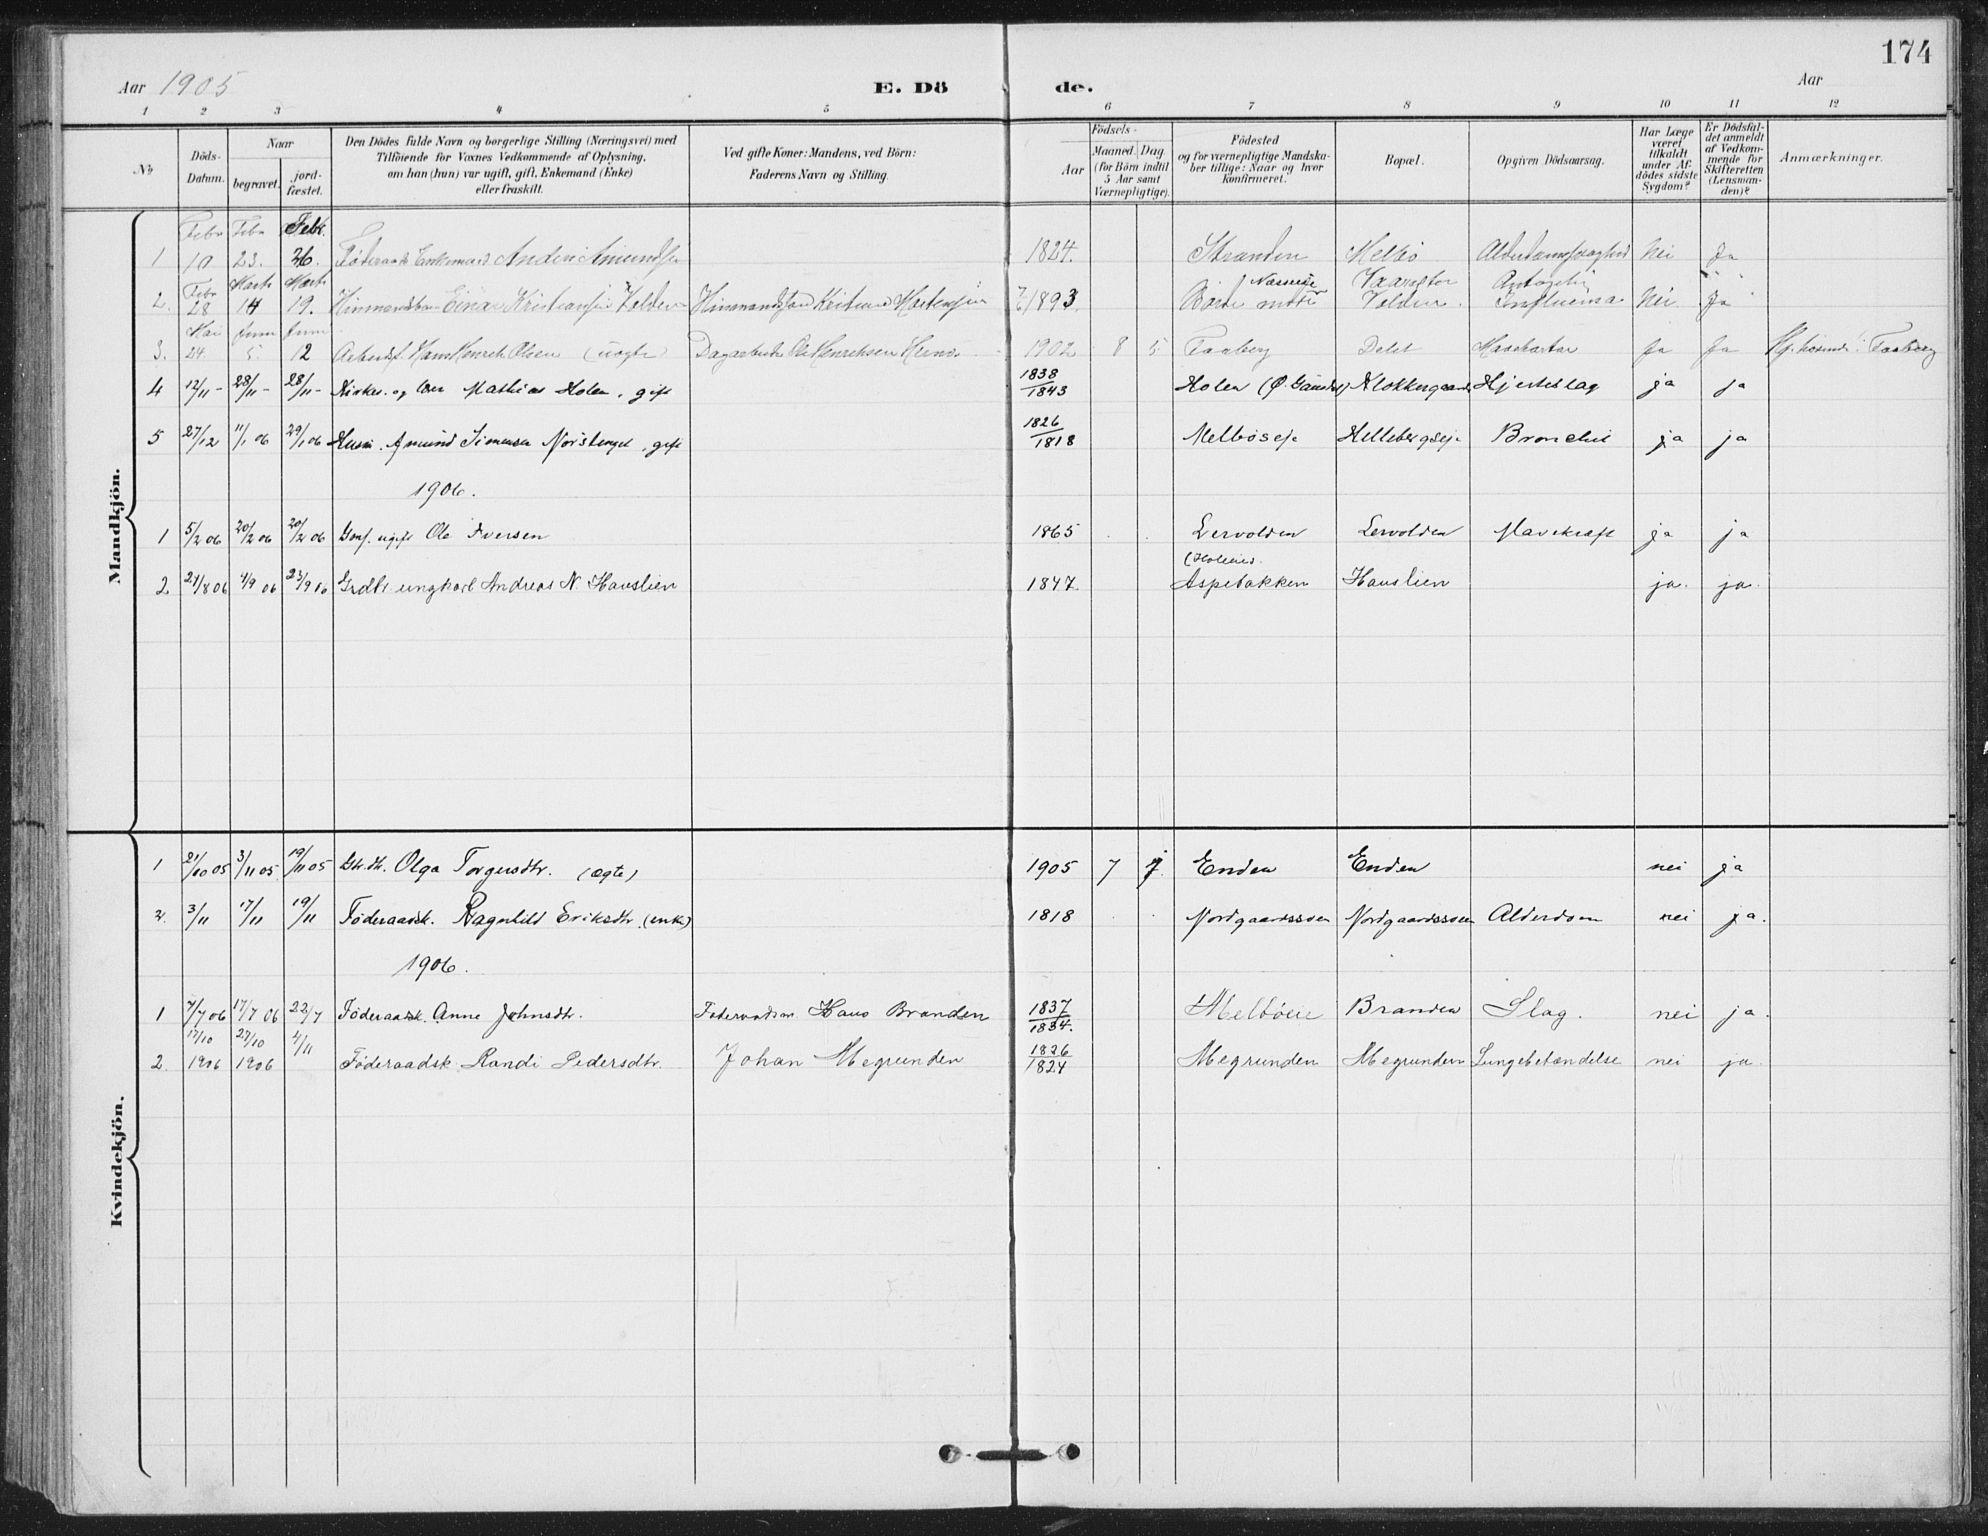 SAH, Vestre Gausdal prestekontor, Klokkerbok nr. 4, 1898-1939, s. 174